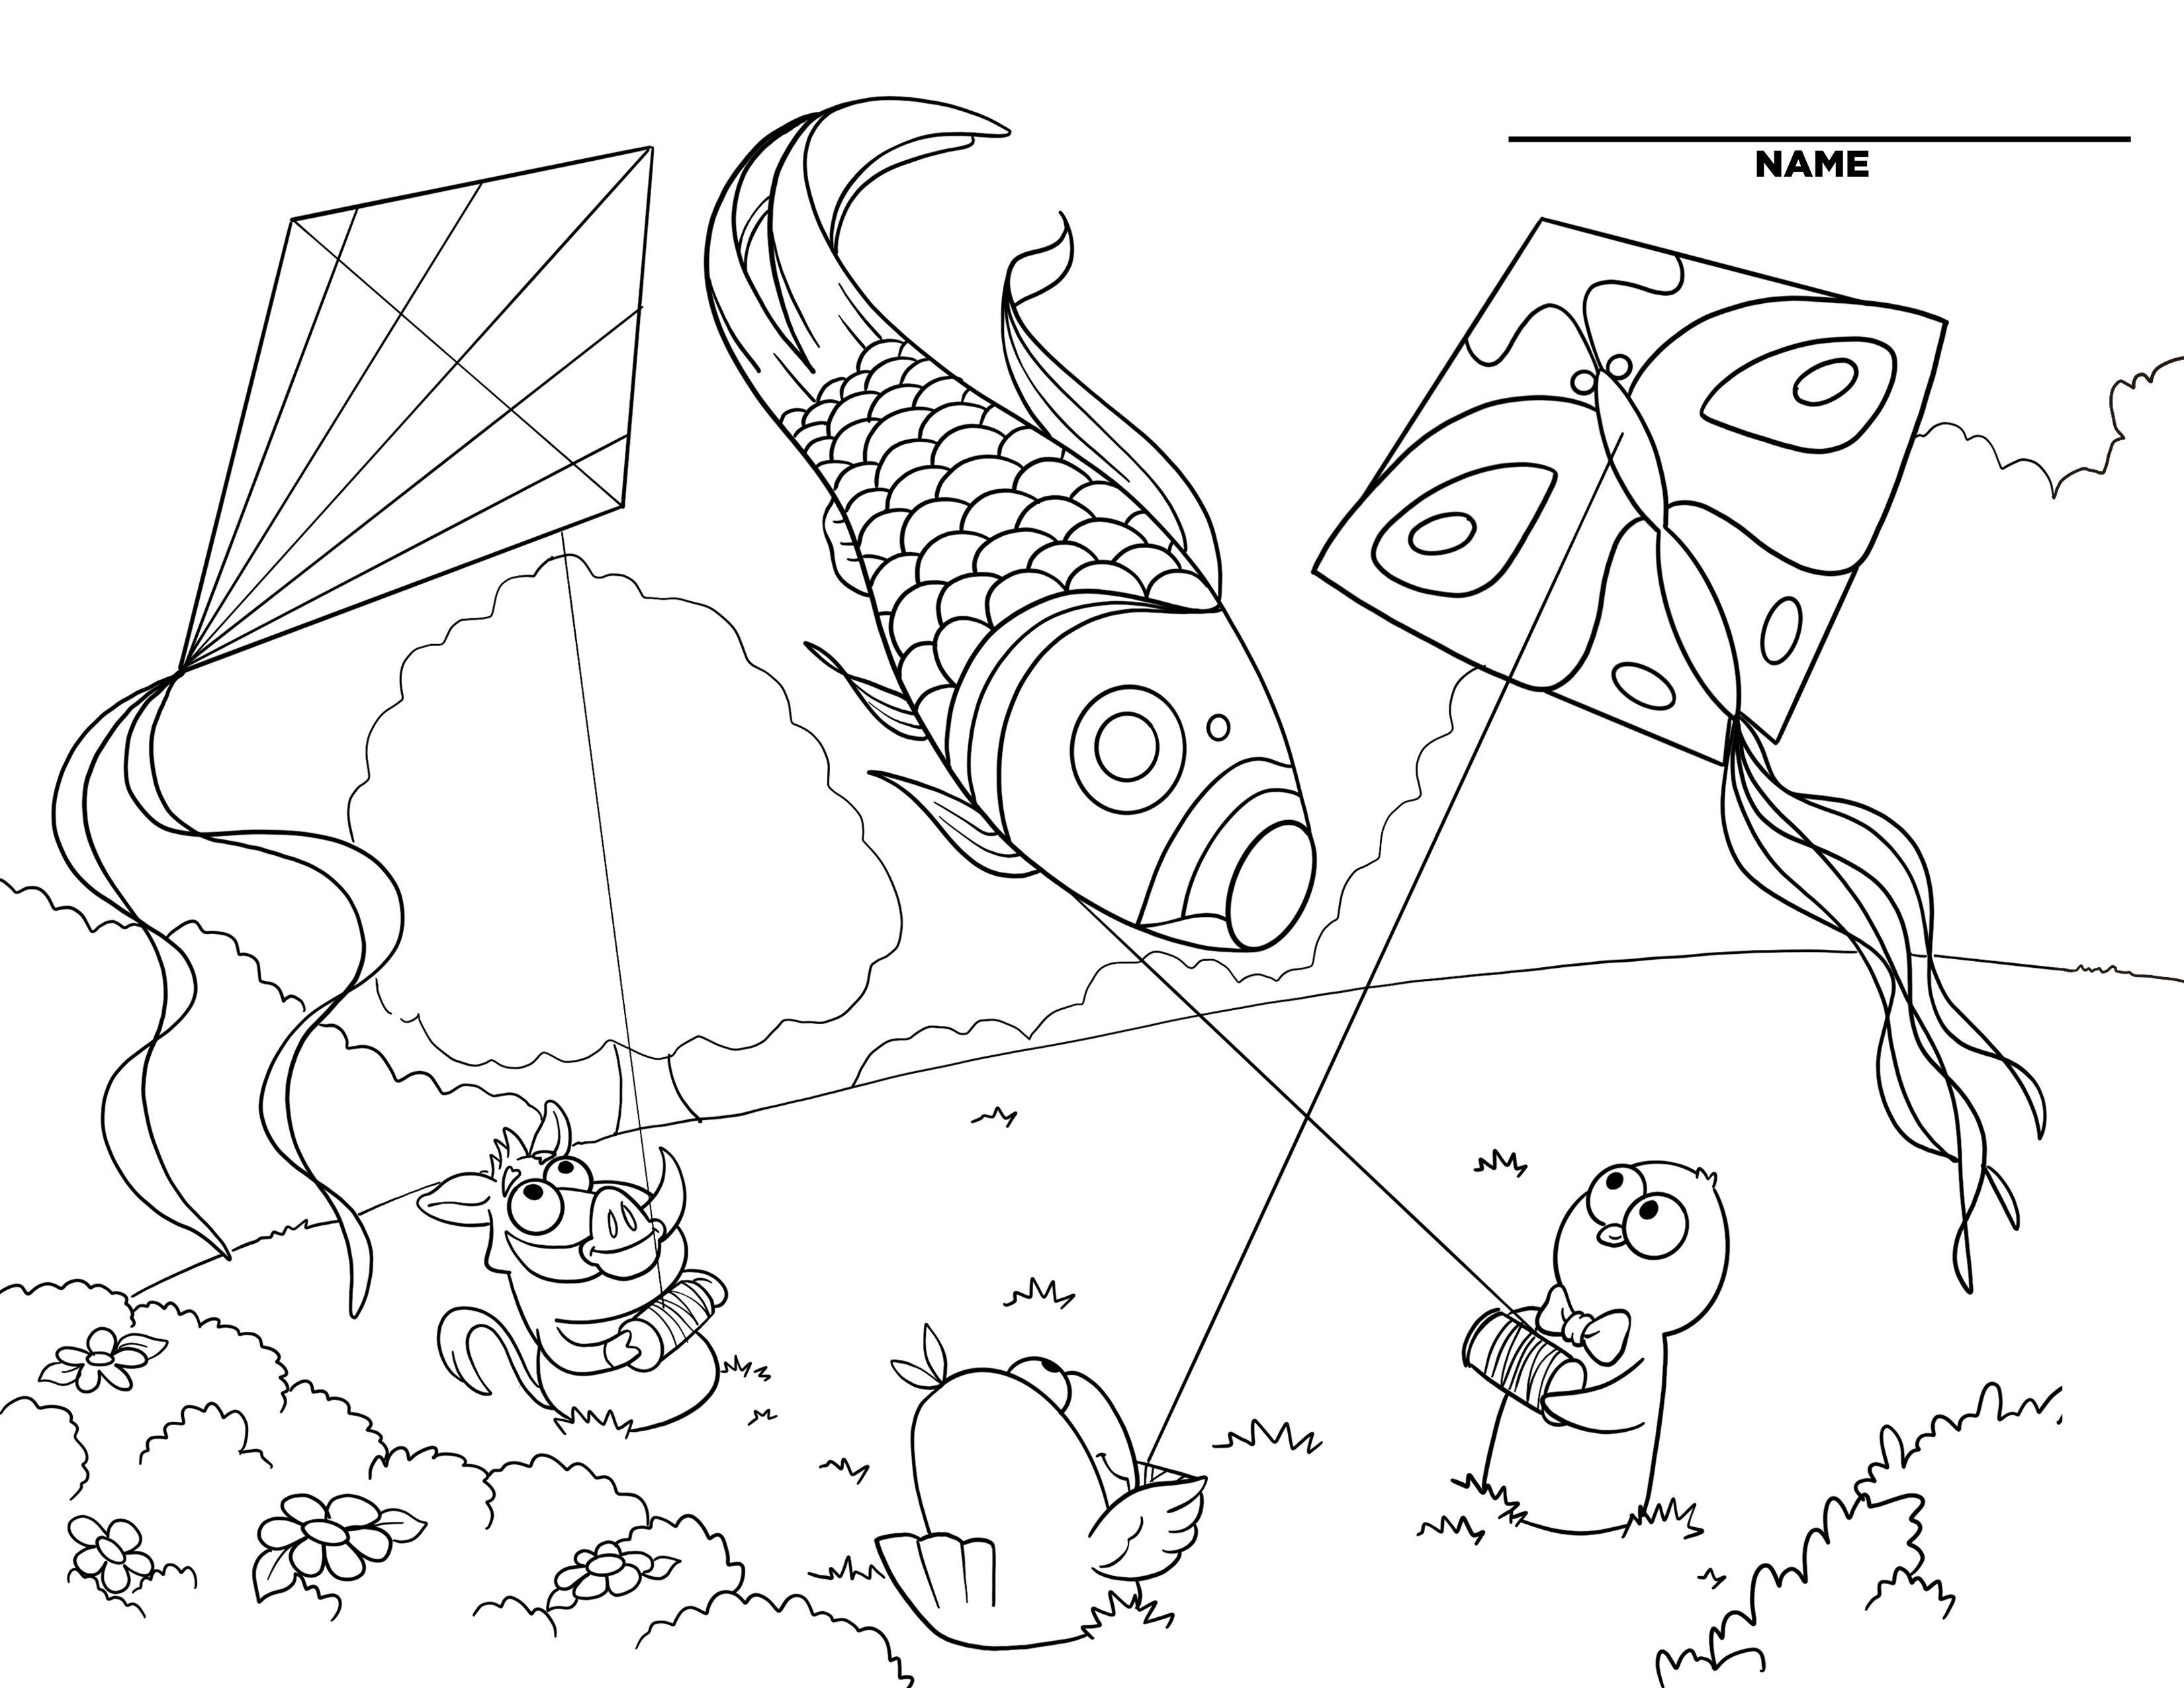 Ekidz Downloadable Coloring Book Page 4 Coloring Books Sketchbook Drawing Drawing Pad